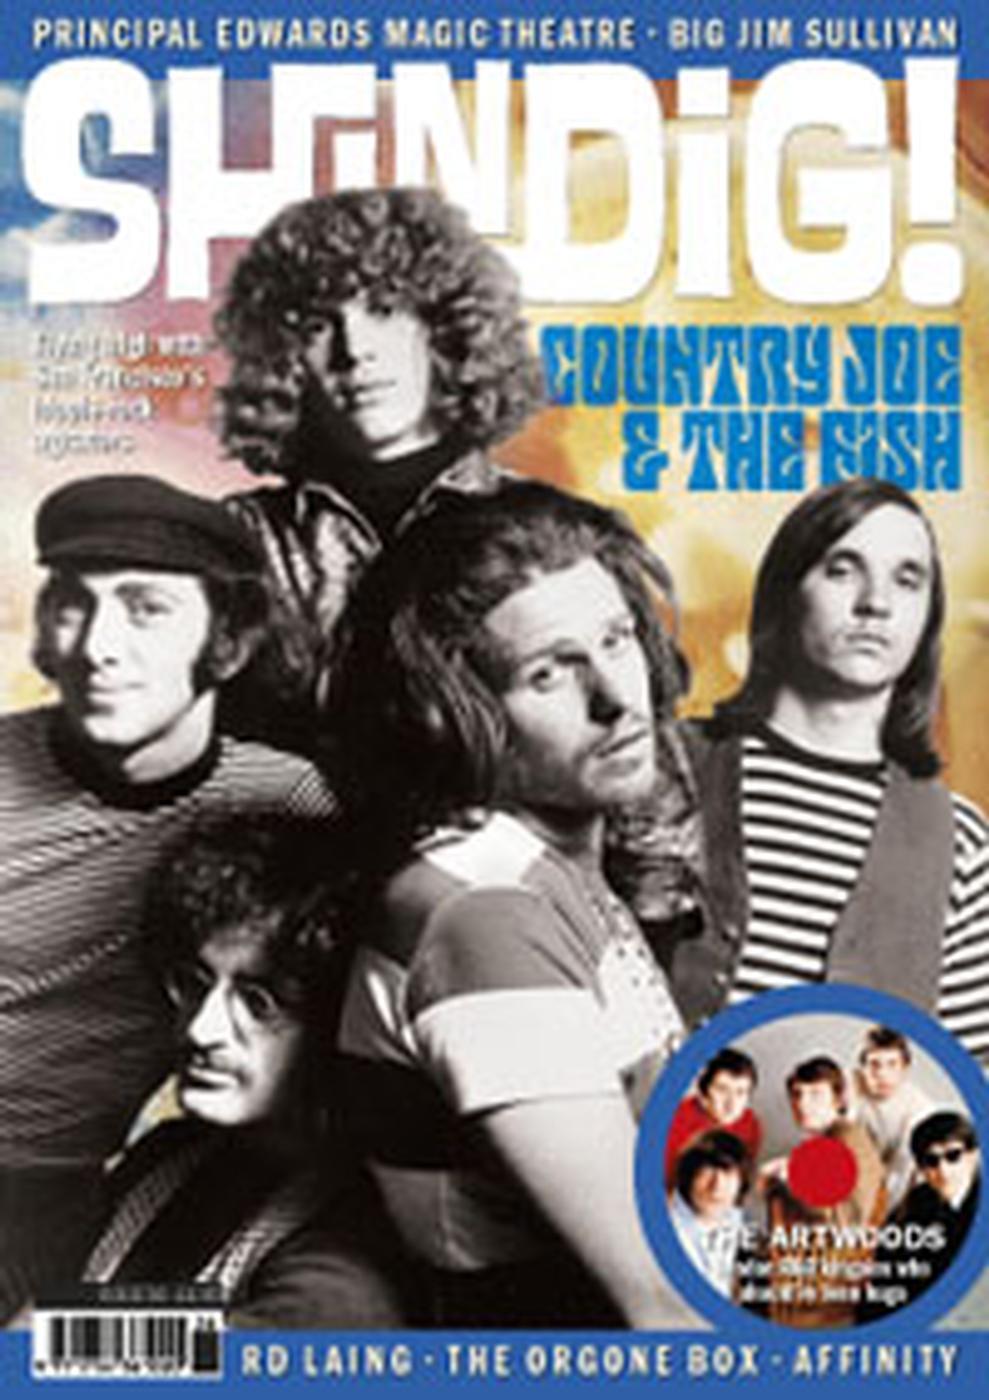 + 'SHINDIG!' MAGAZINE - Issue 36 Feat Country Joe